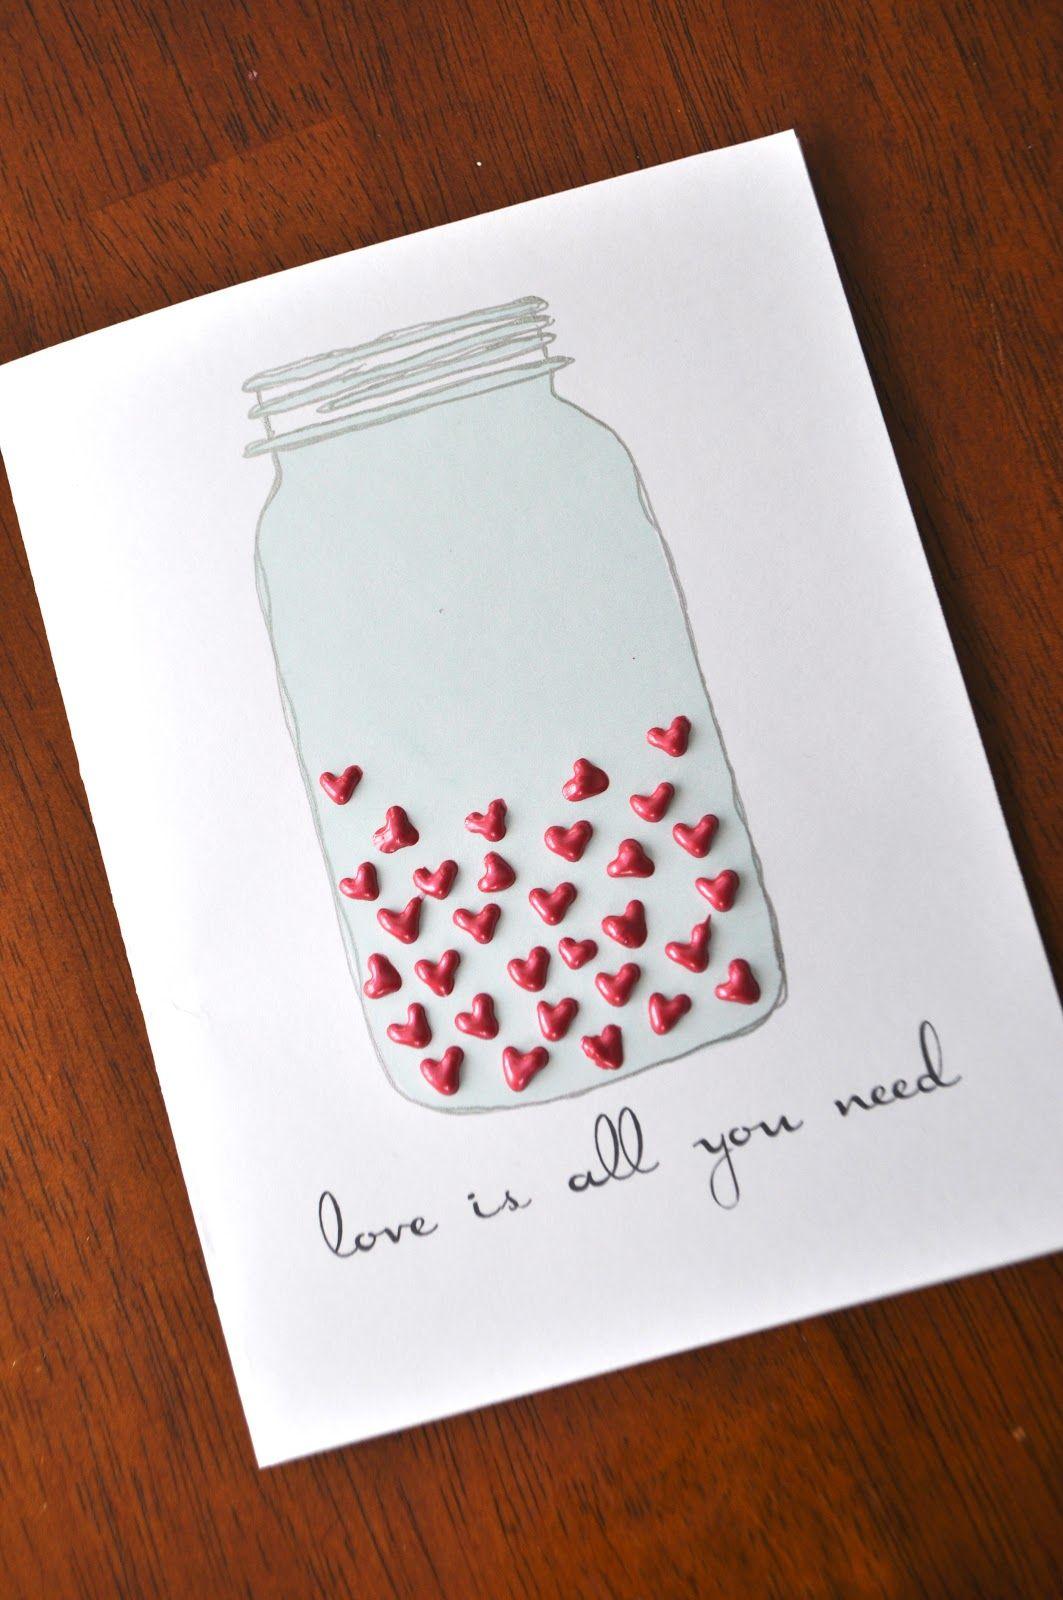 homemade valentine cards | Am Momma - Hear Me Roar: Homemade ...